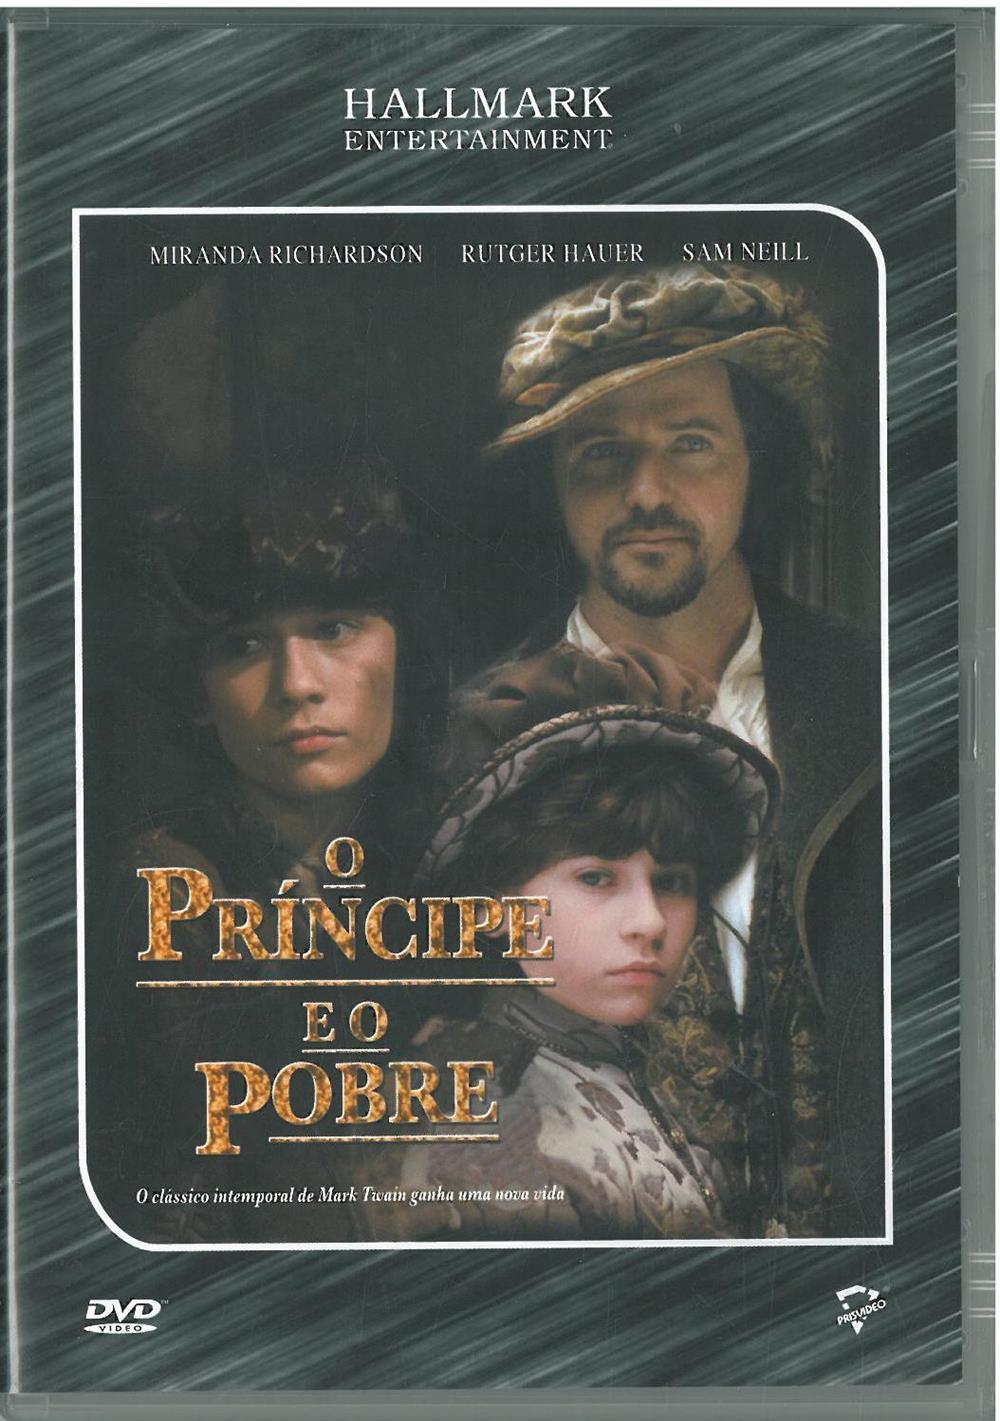 O príncipe e o pobre_DVD.jpg